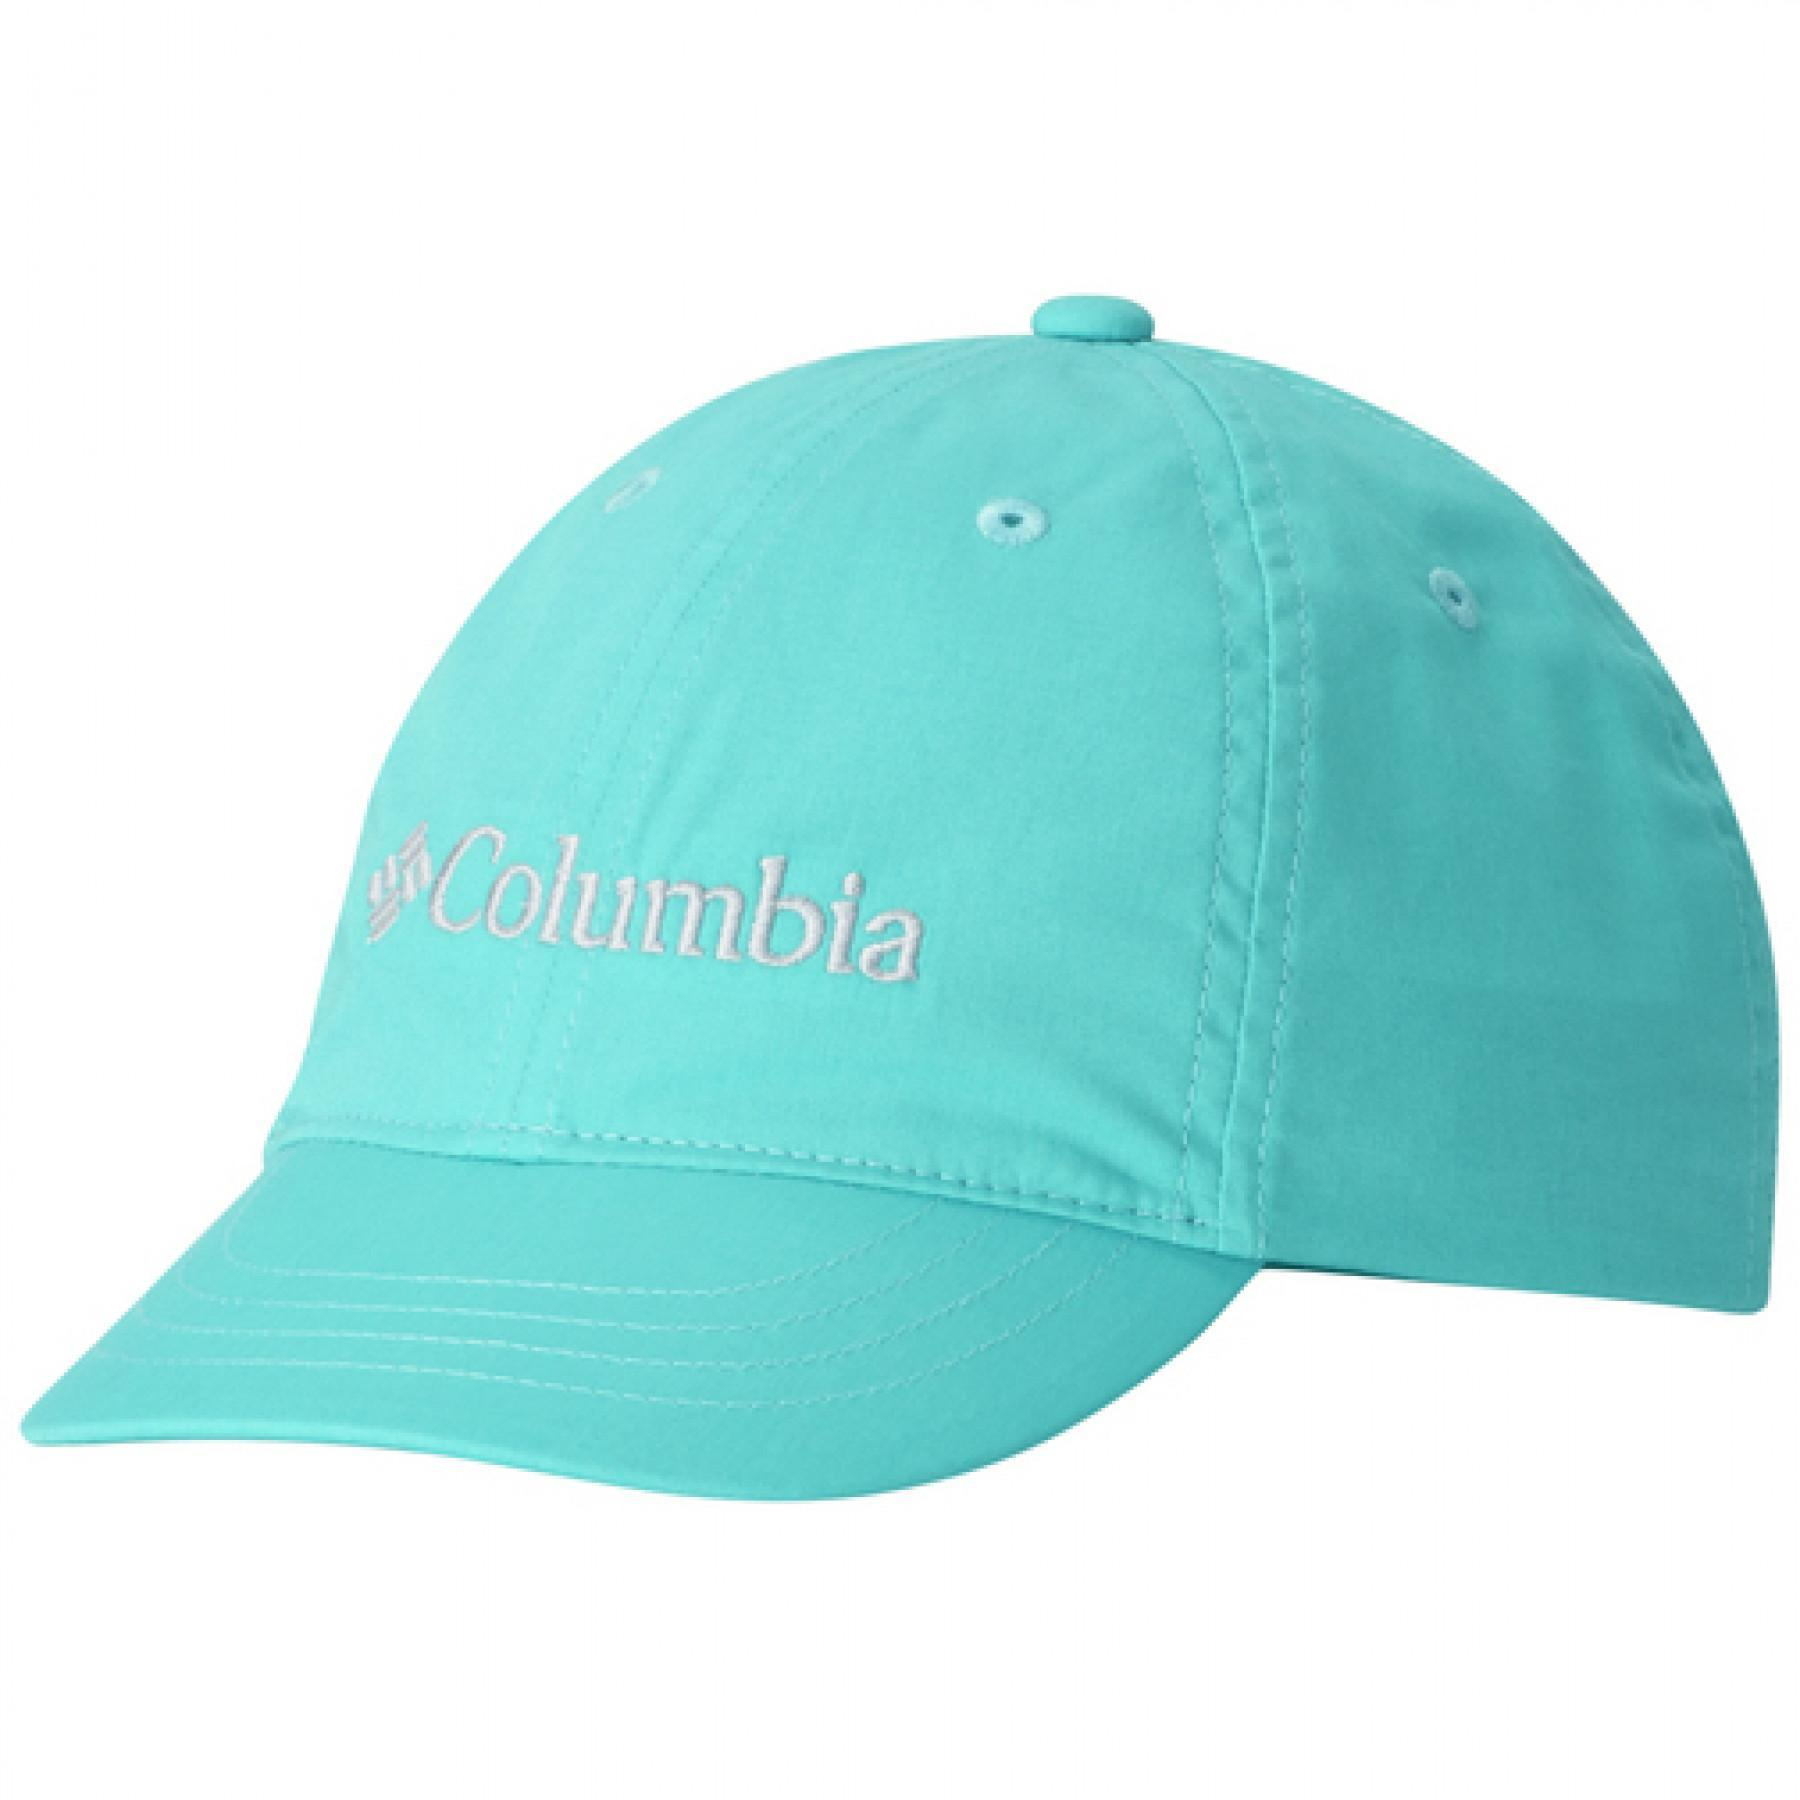 Columbia Adjustable Ball Junior Cap